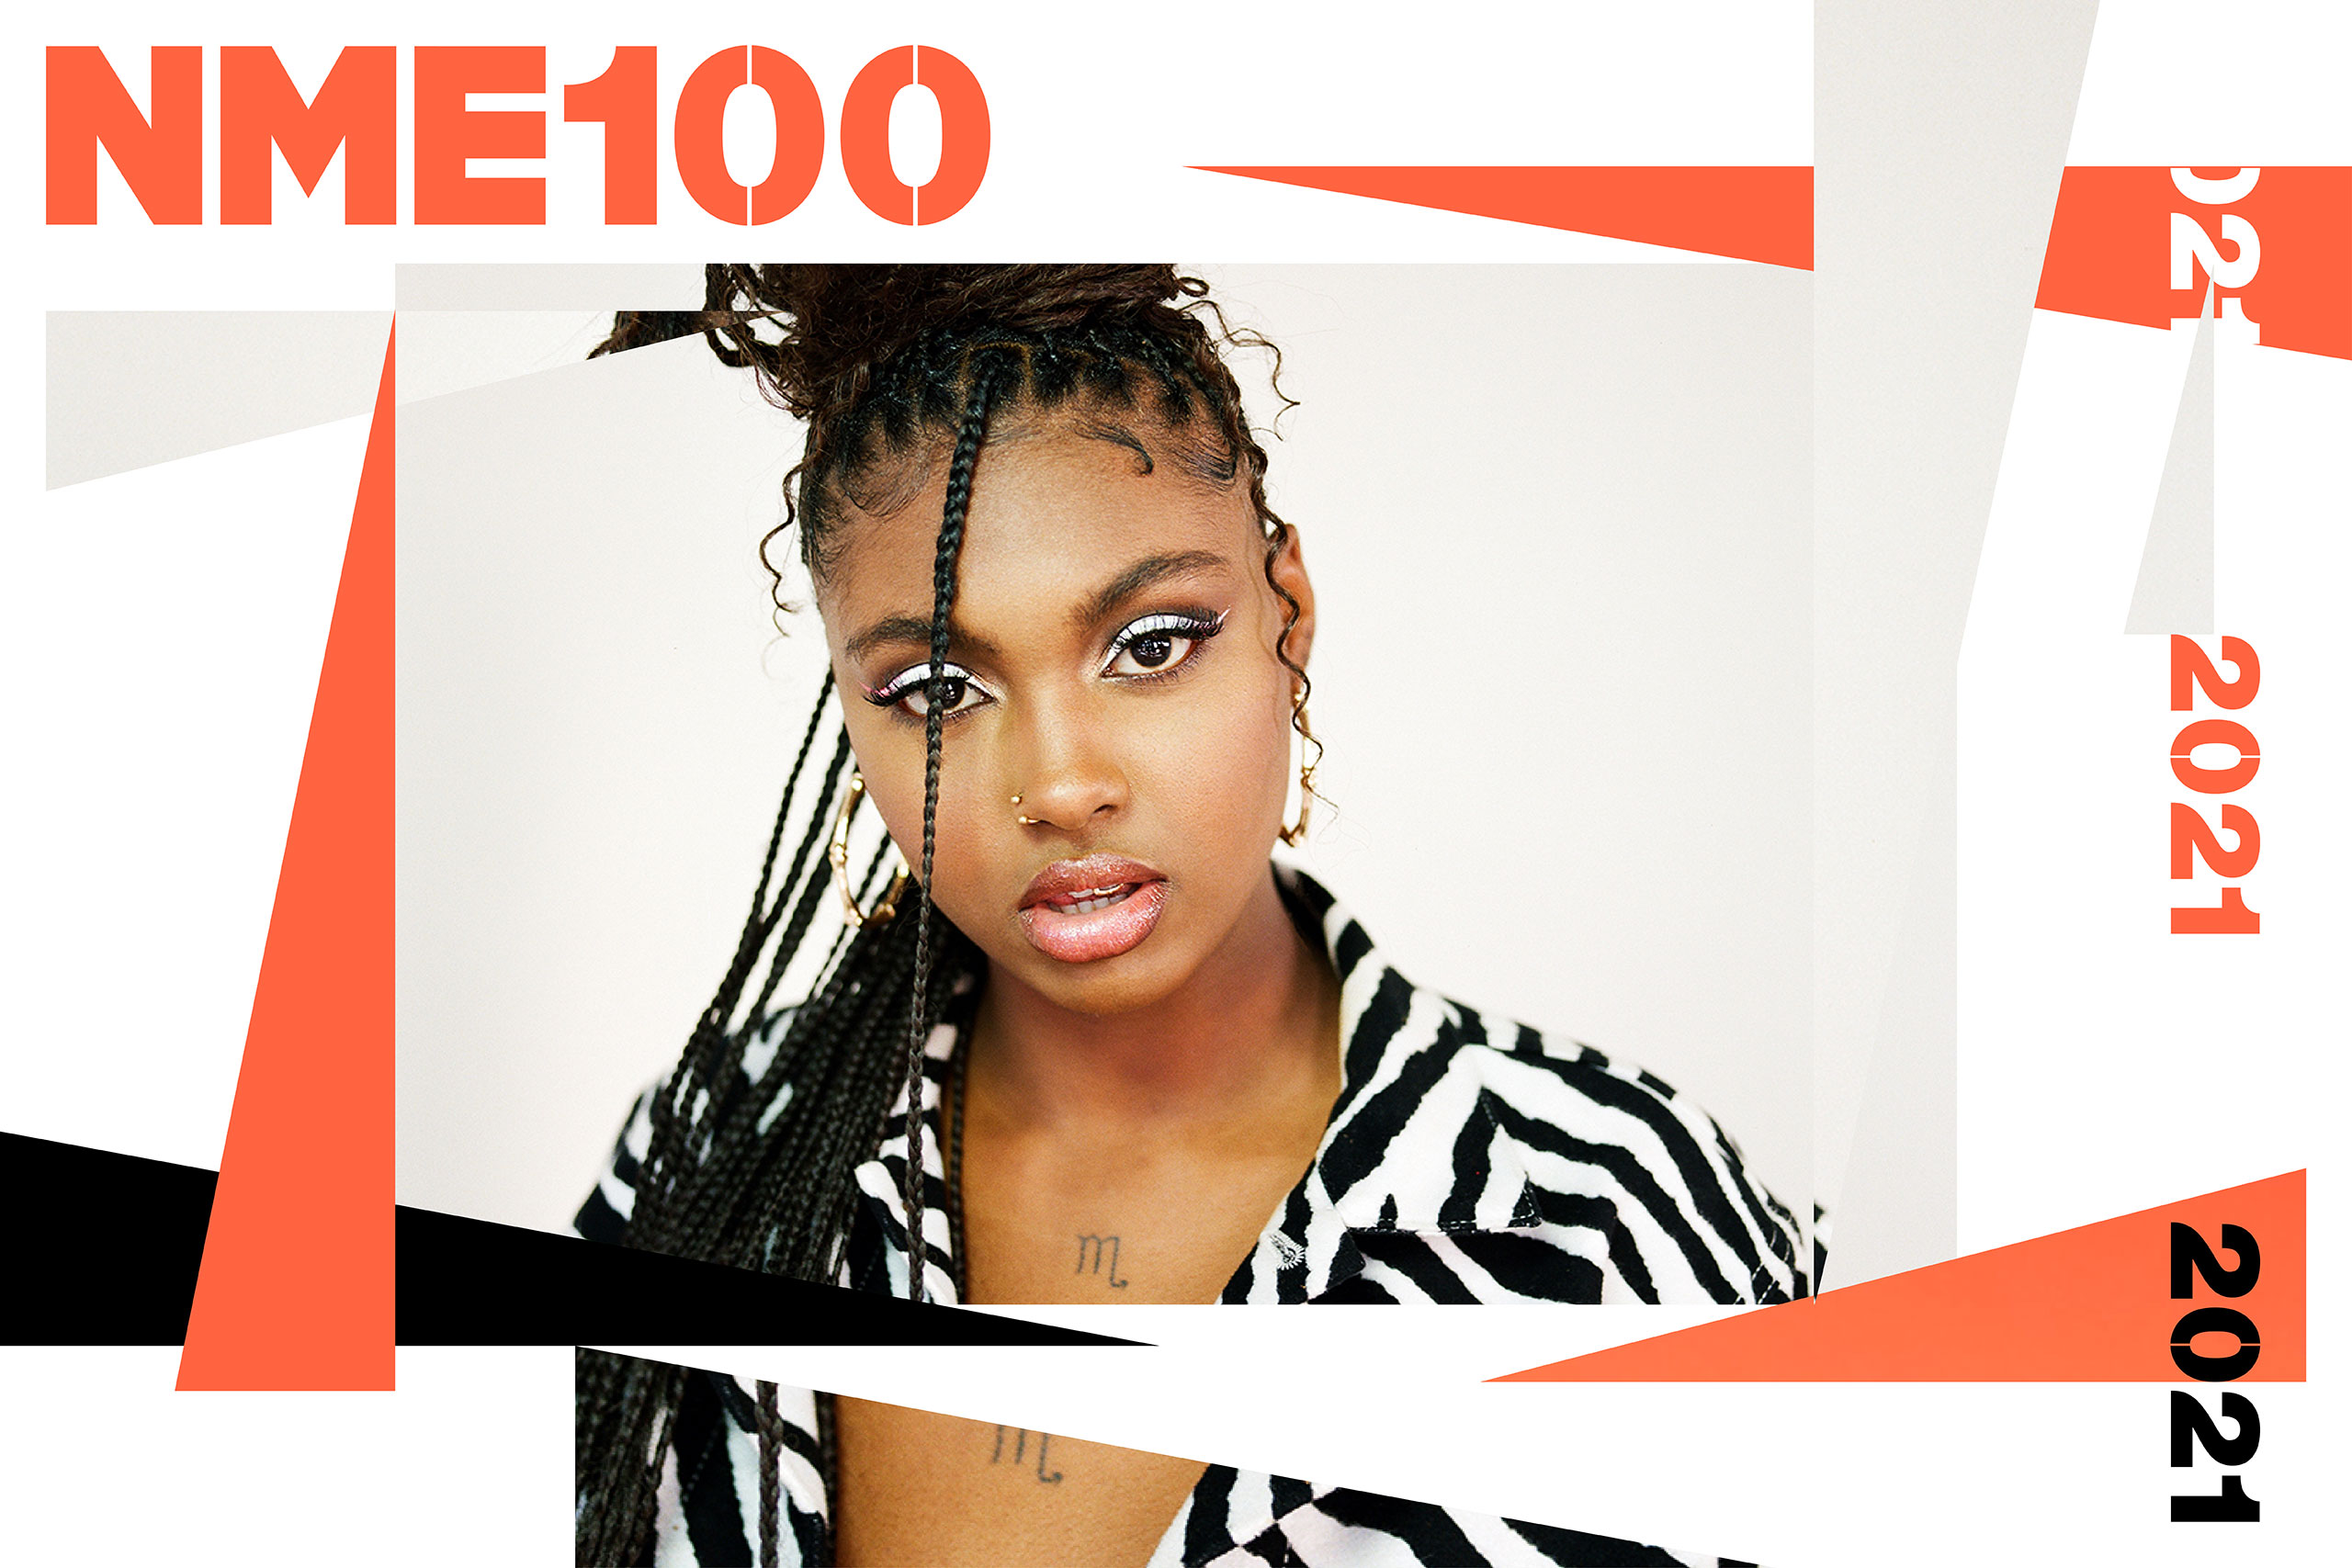 NME 100 tiana major9